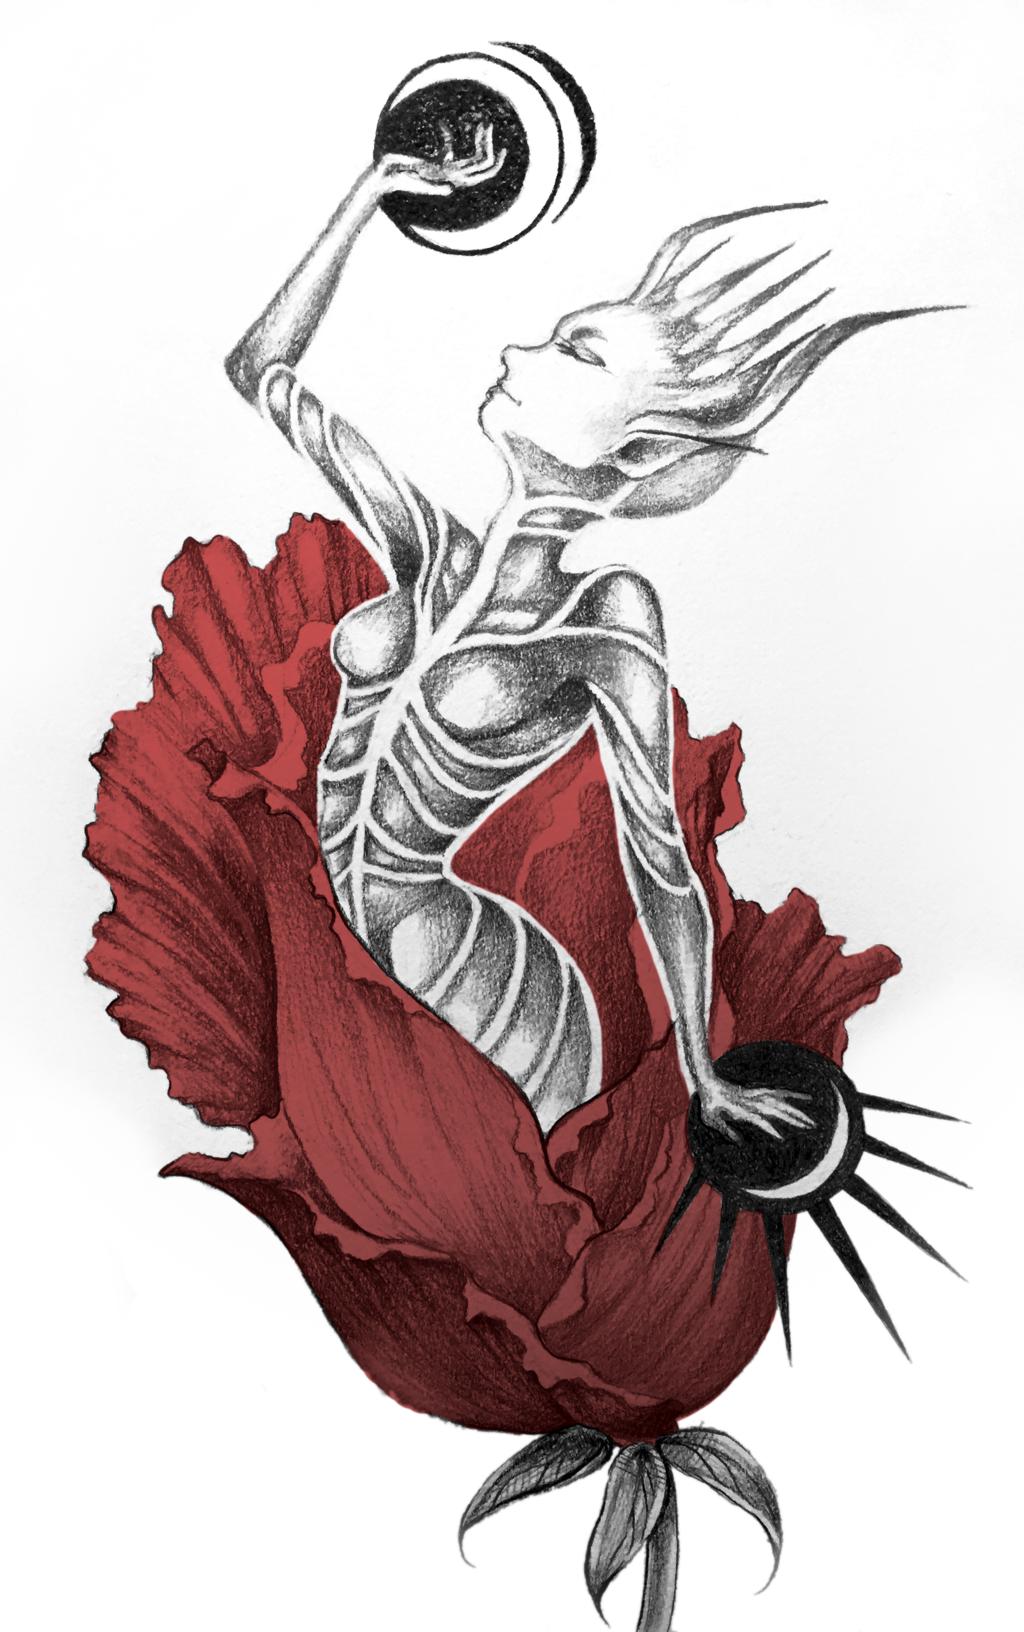 Most recent image: Rebirth